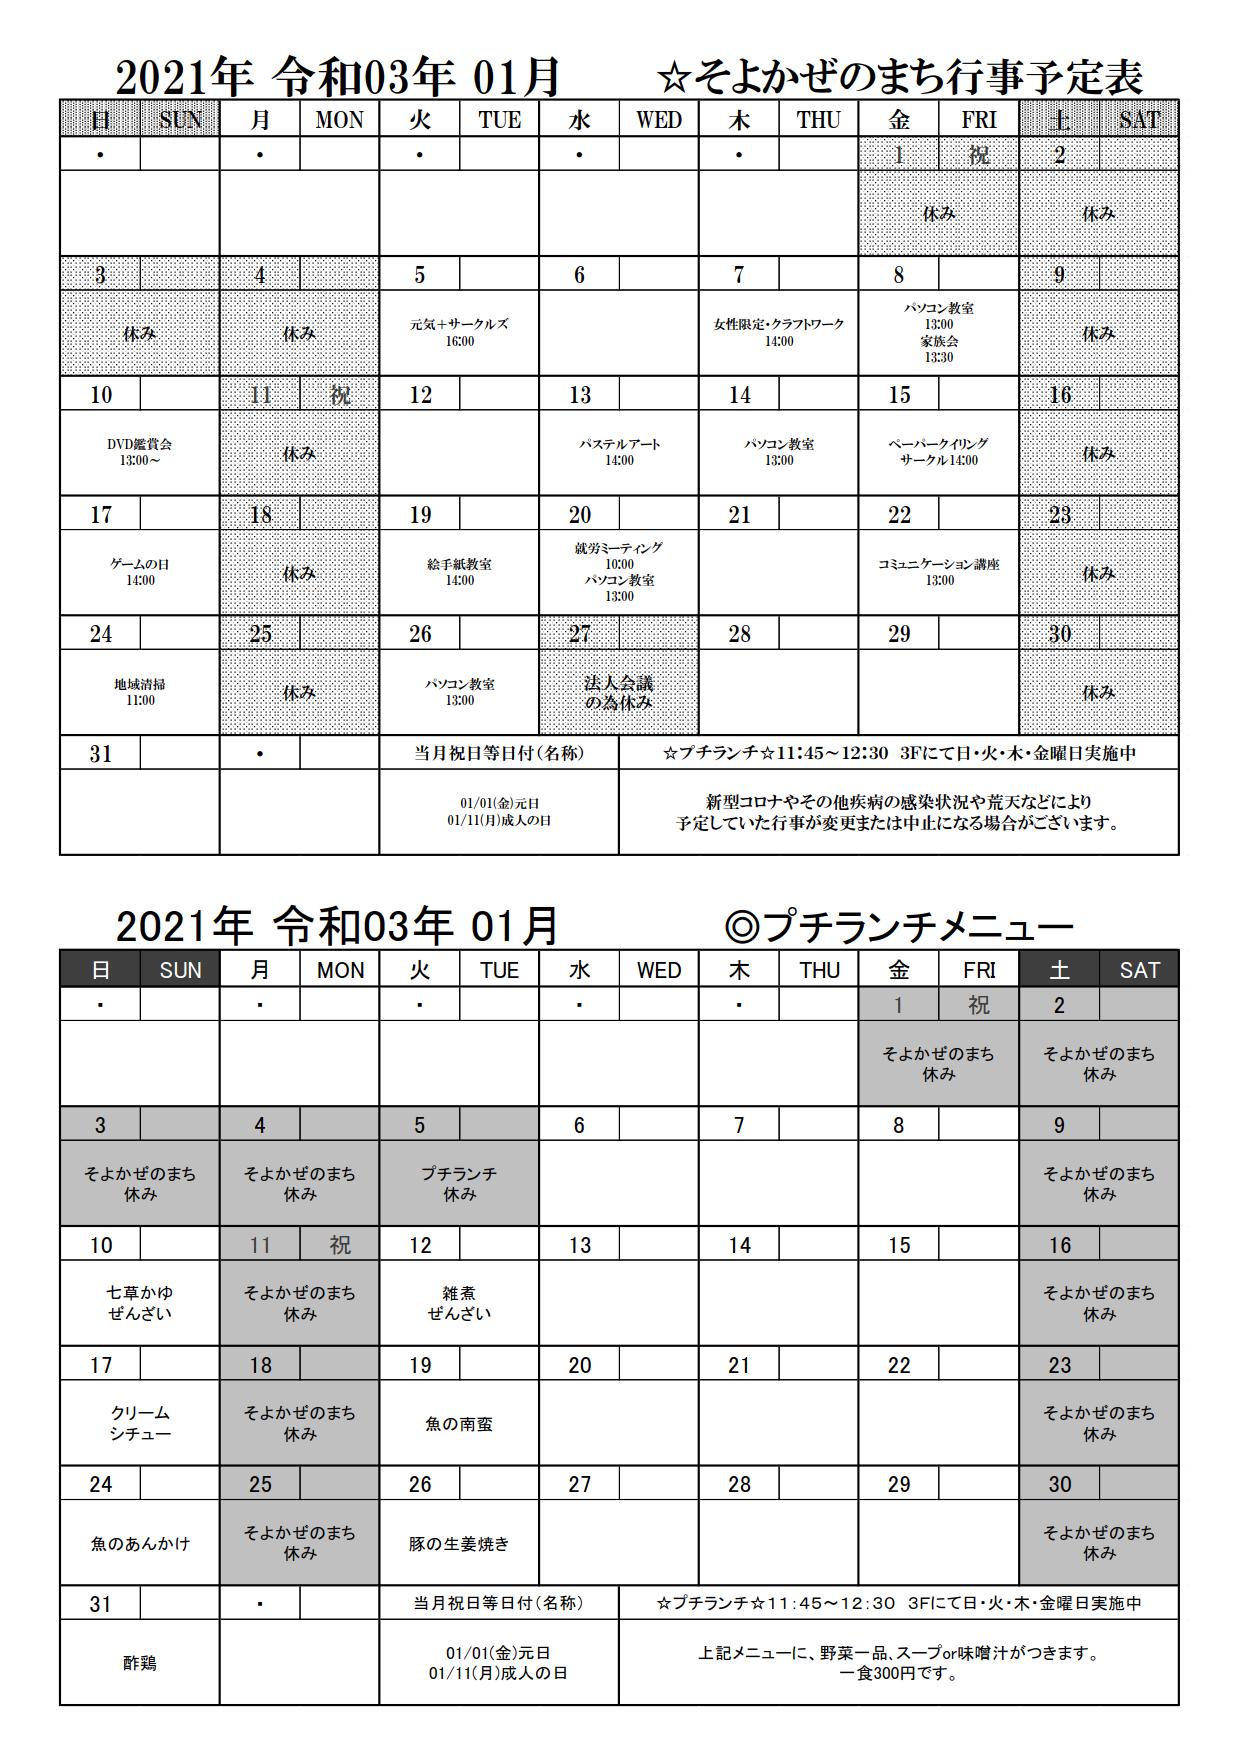 2020-12-2021-01-04